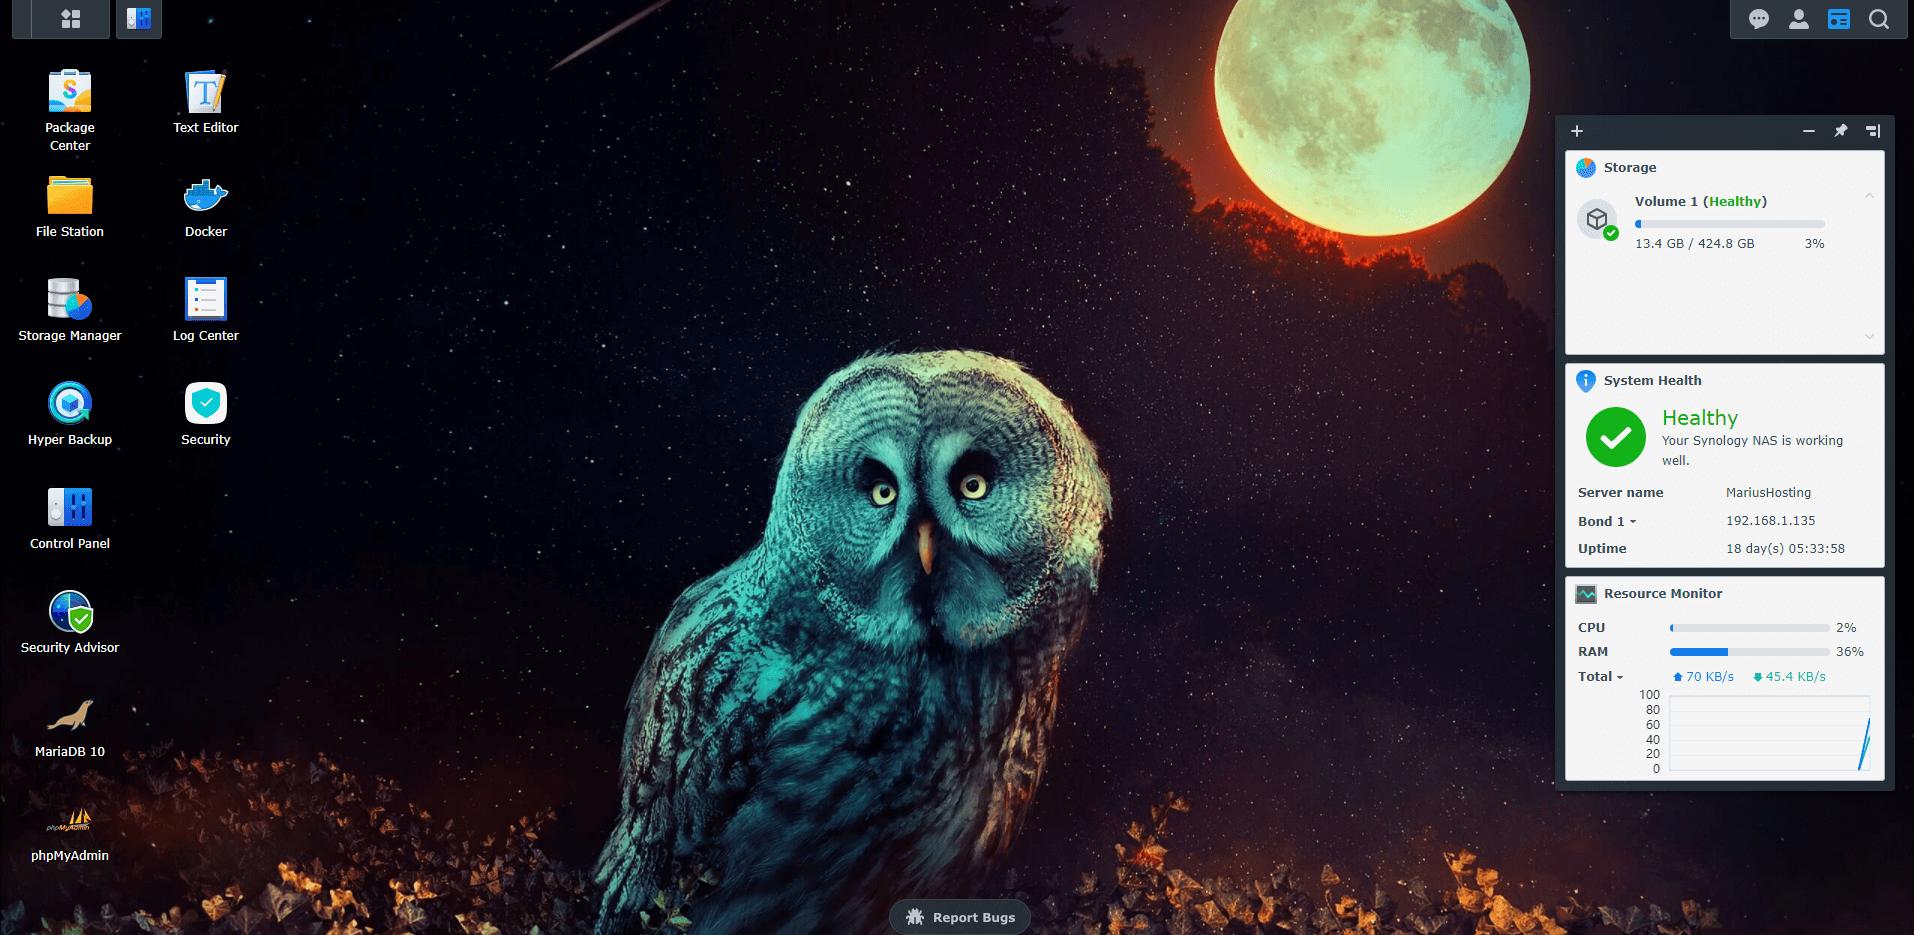 9 Synology Owl Wallpaper